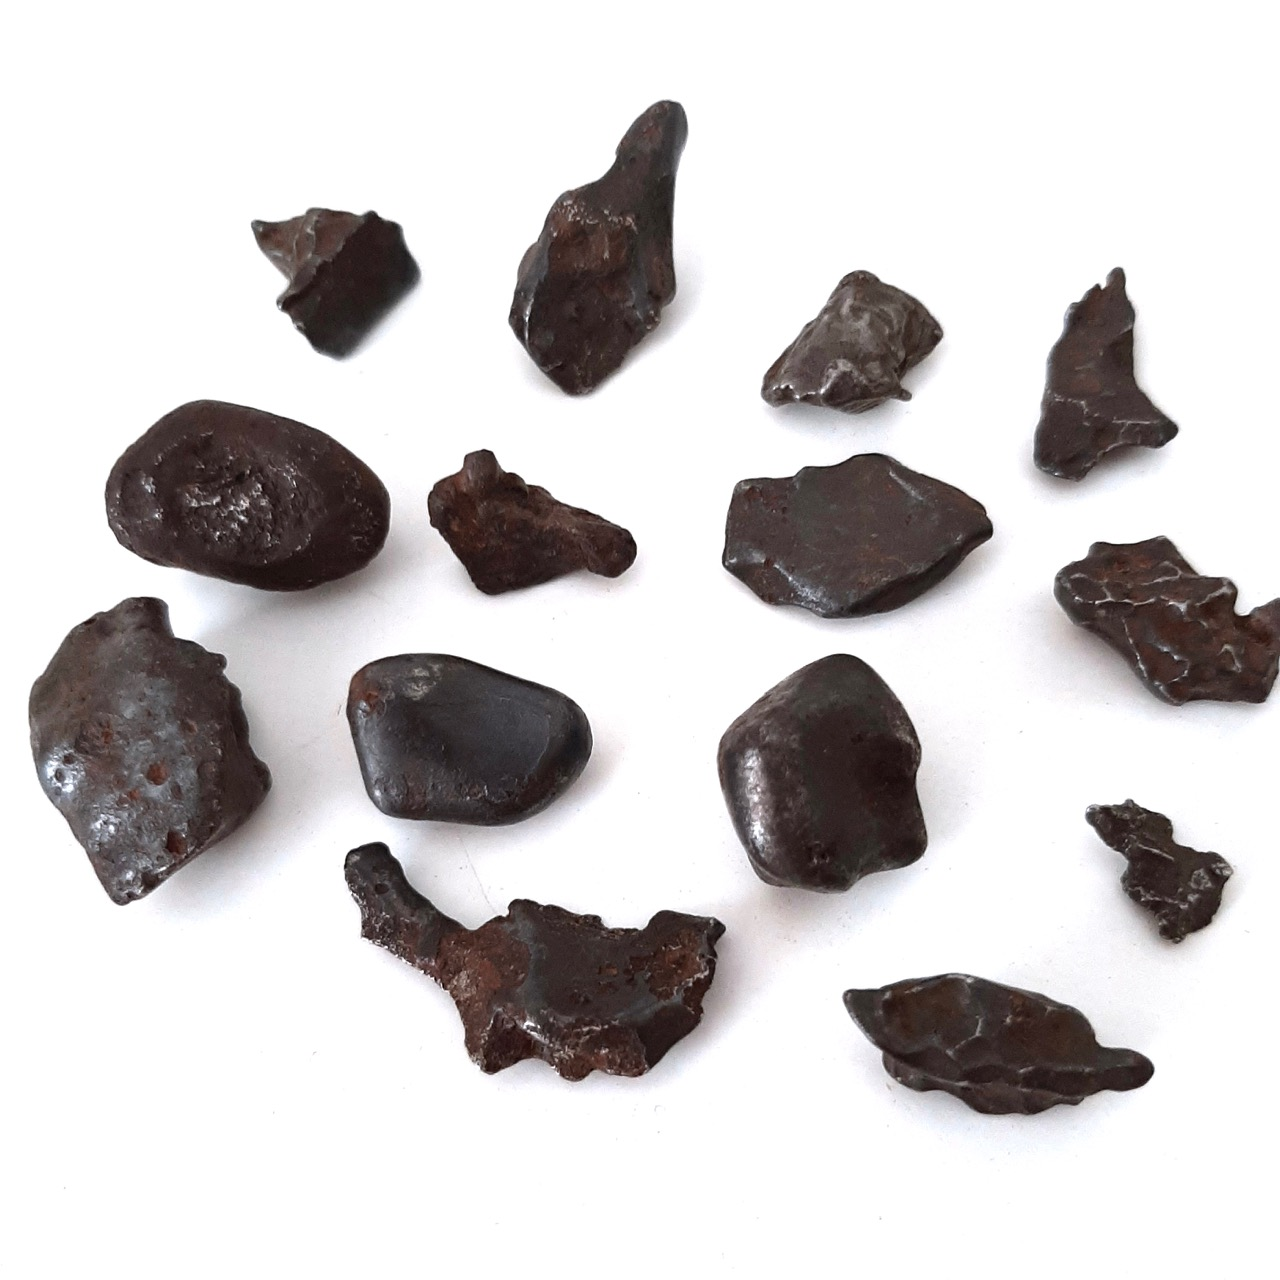 Sikhote Alin meteorite. 14 pieces.